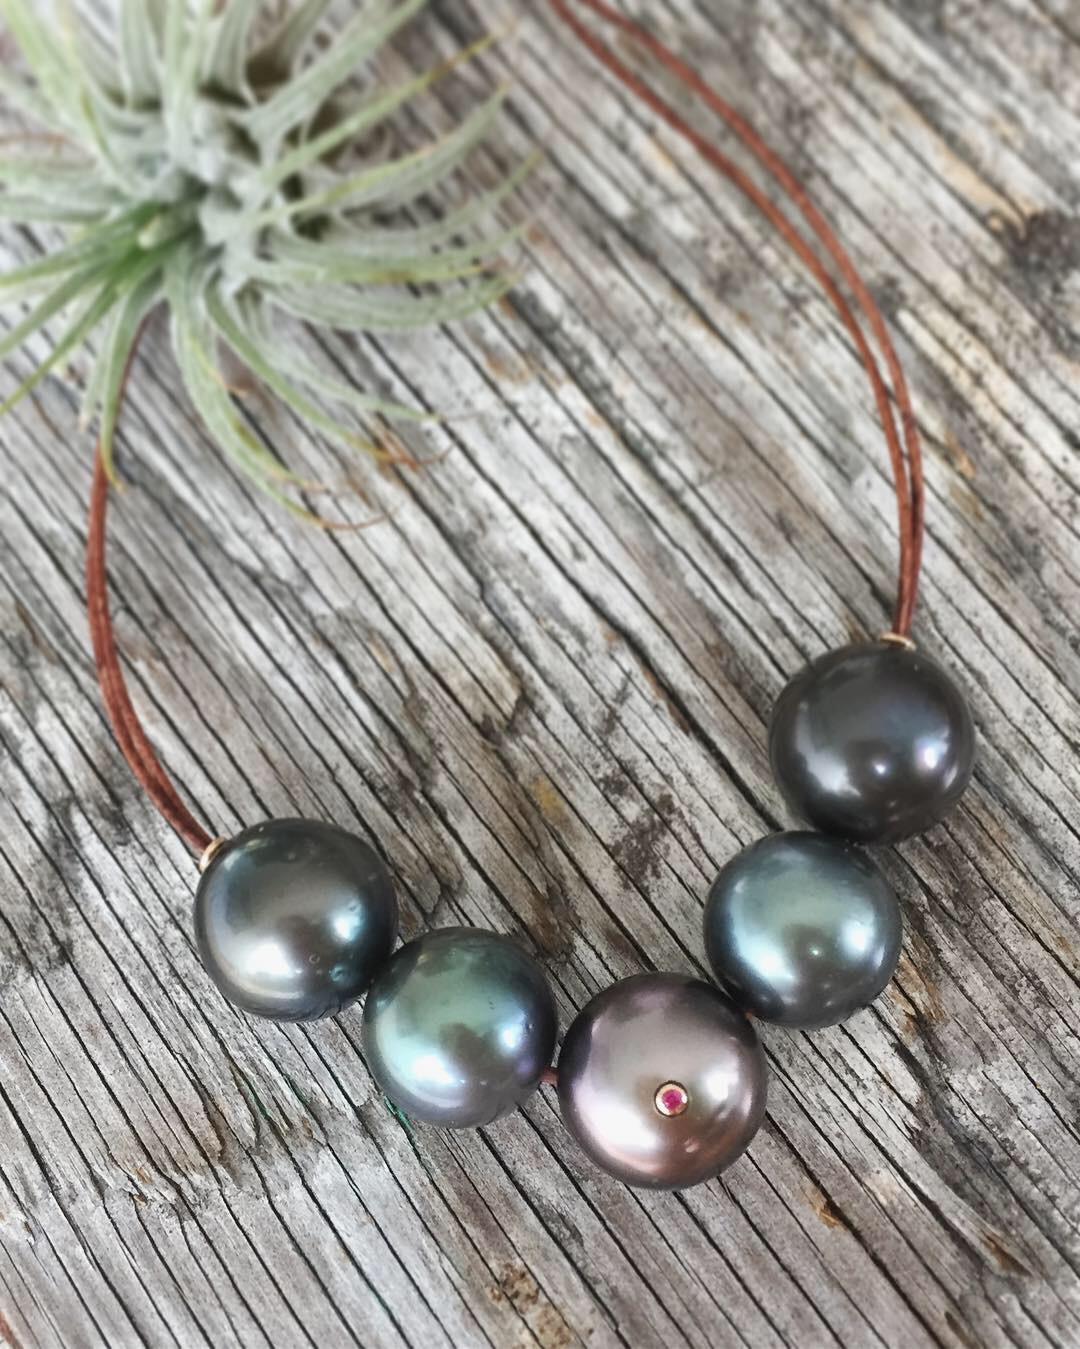 verena-strigler-tahitian-pearl-black-necklace-leather-rose-gold-pink-sapphire-vancouver.jpg